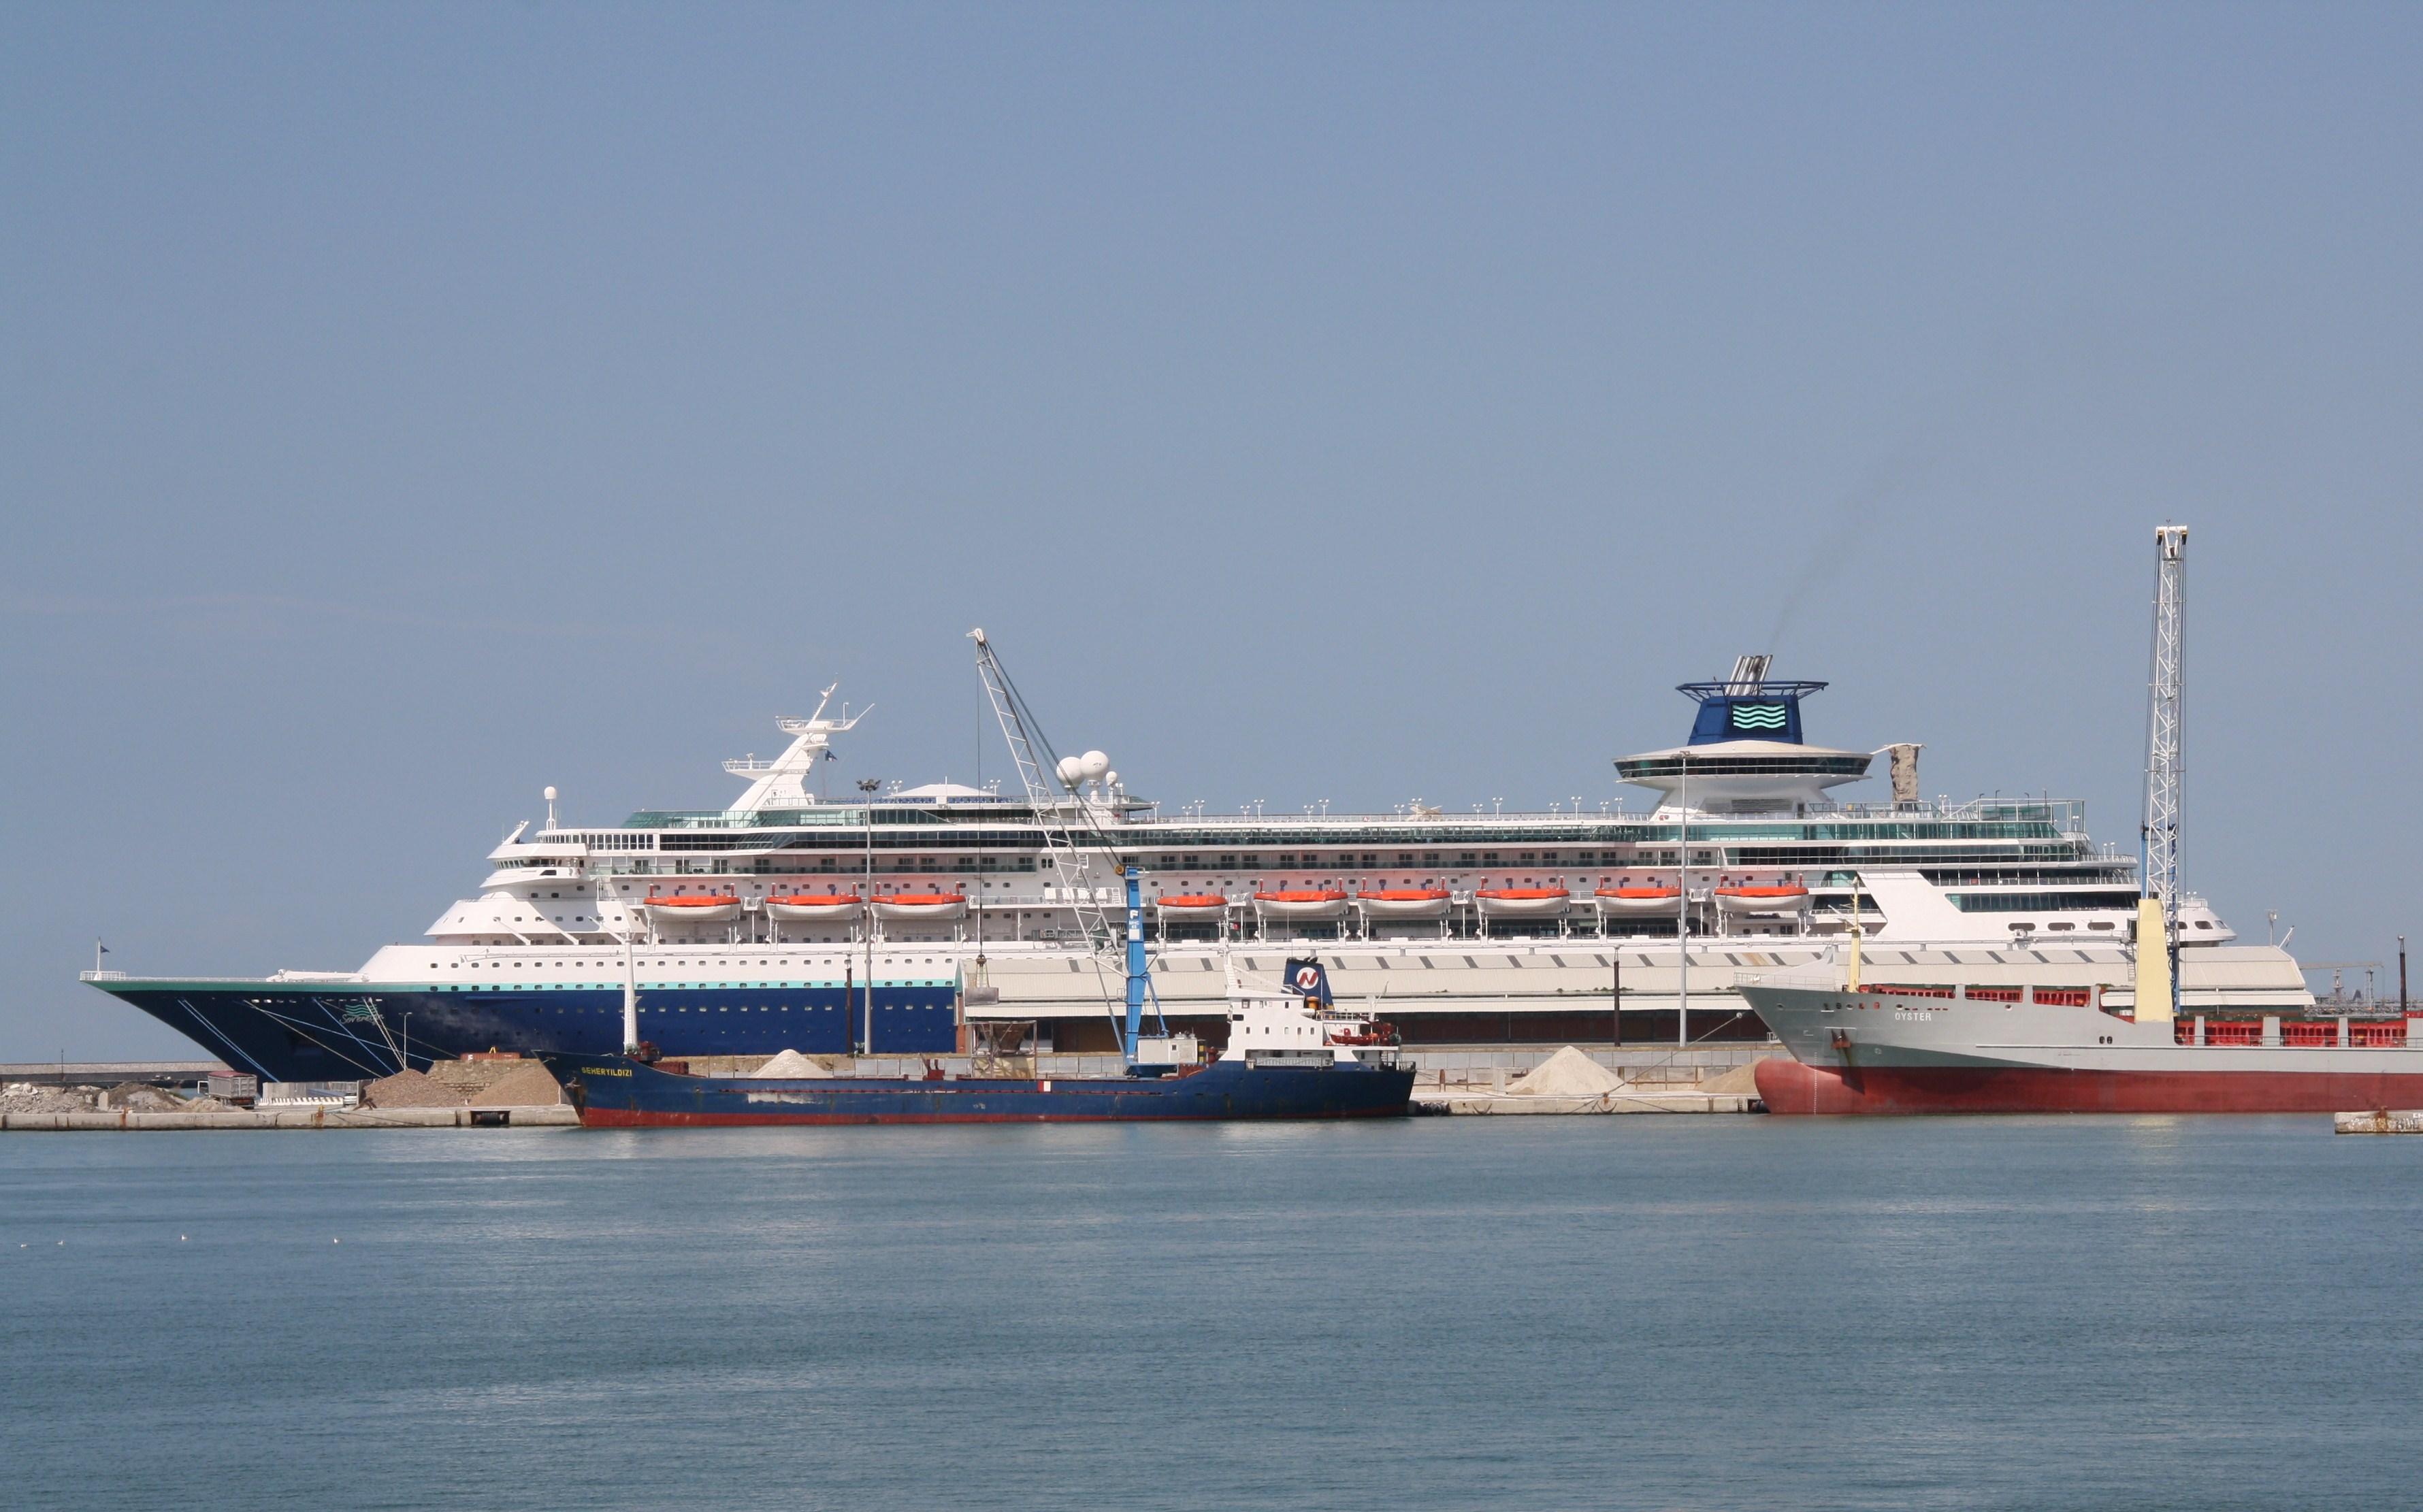 FilePullmantur Cruises Sovereign JPG Wikimedia Commons - Ms sovereign cruise ship